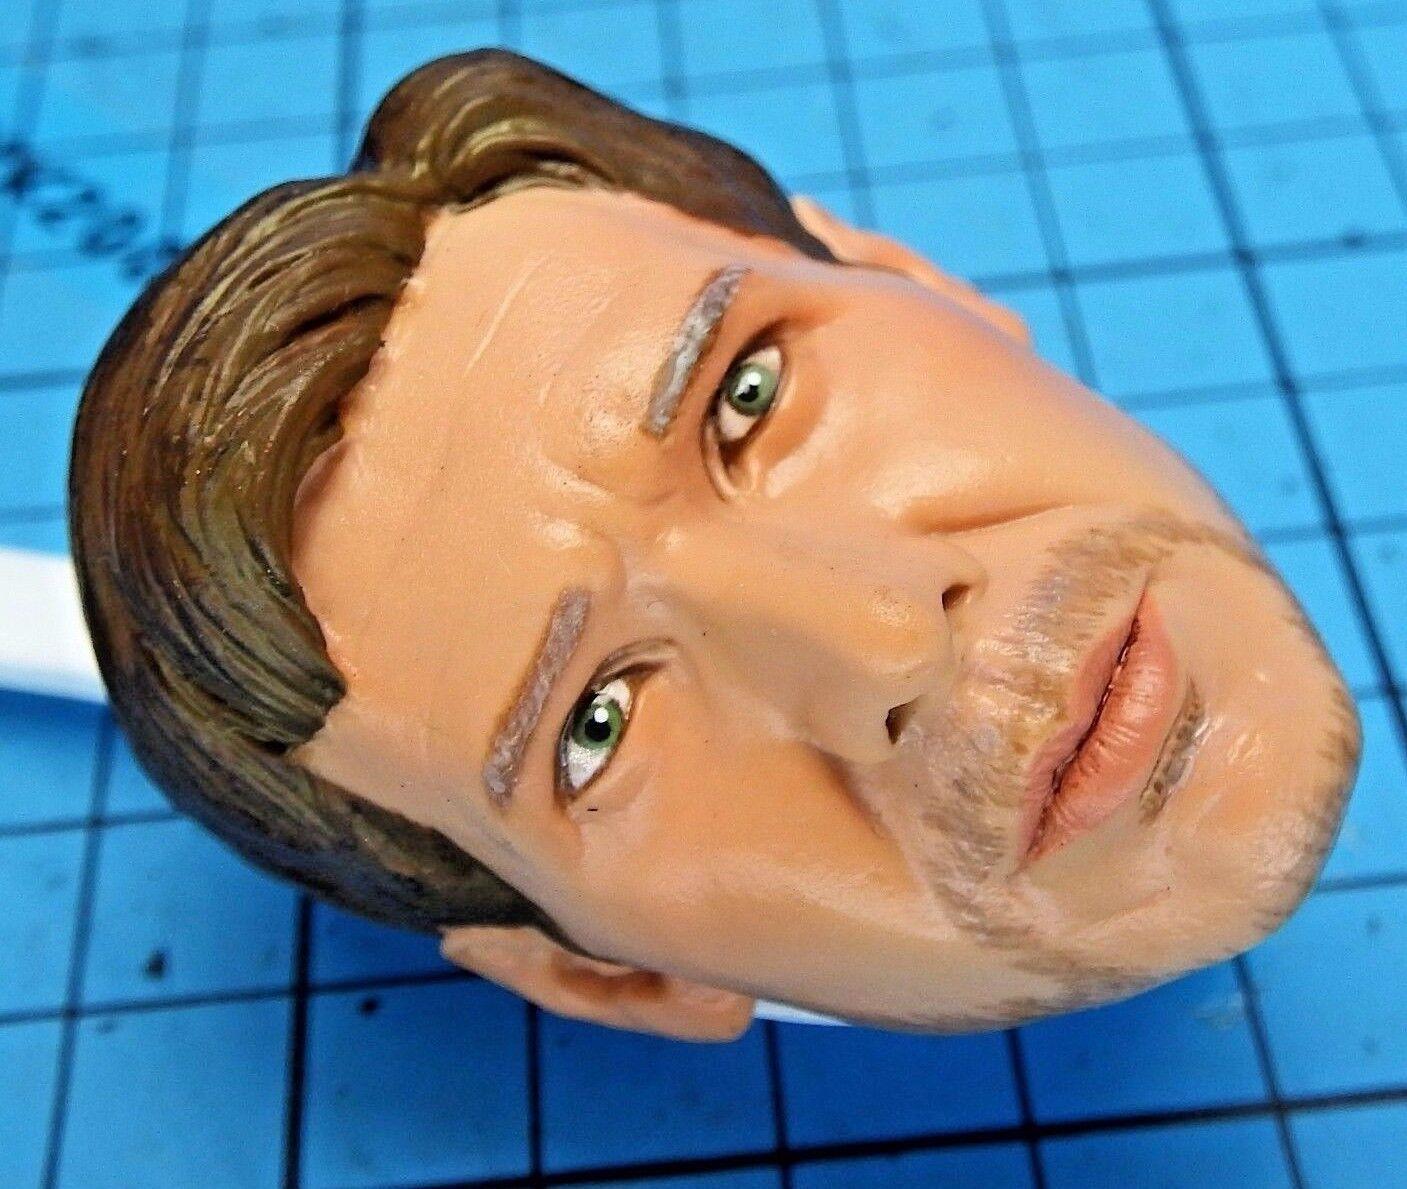 Sideshow 1 6 Indiana Jones Raiders of the Lost Ark Figure - Harrison Ford Head